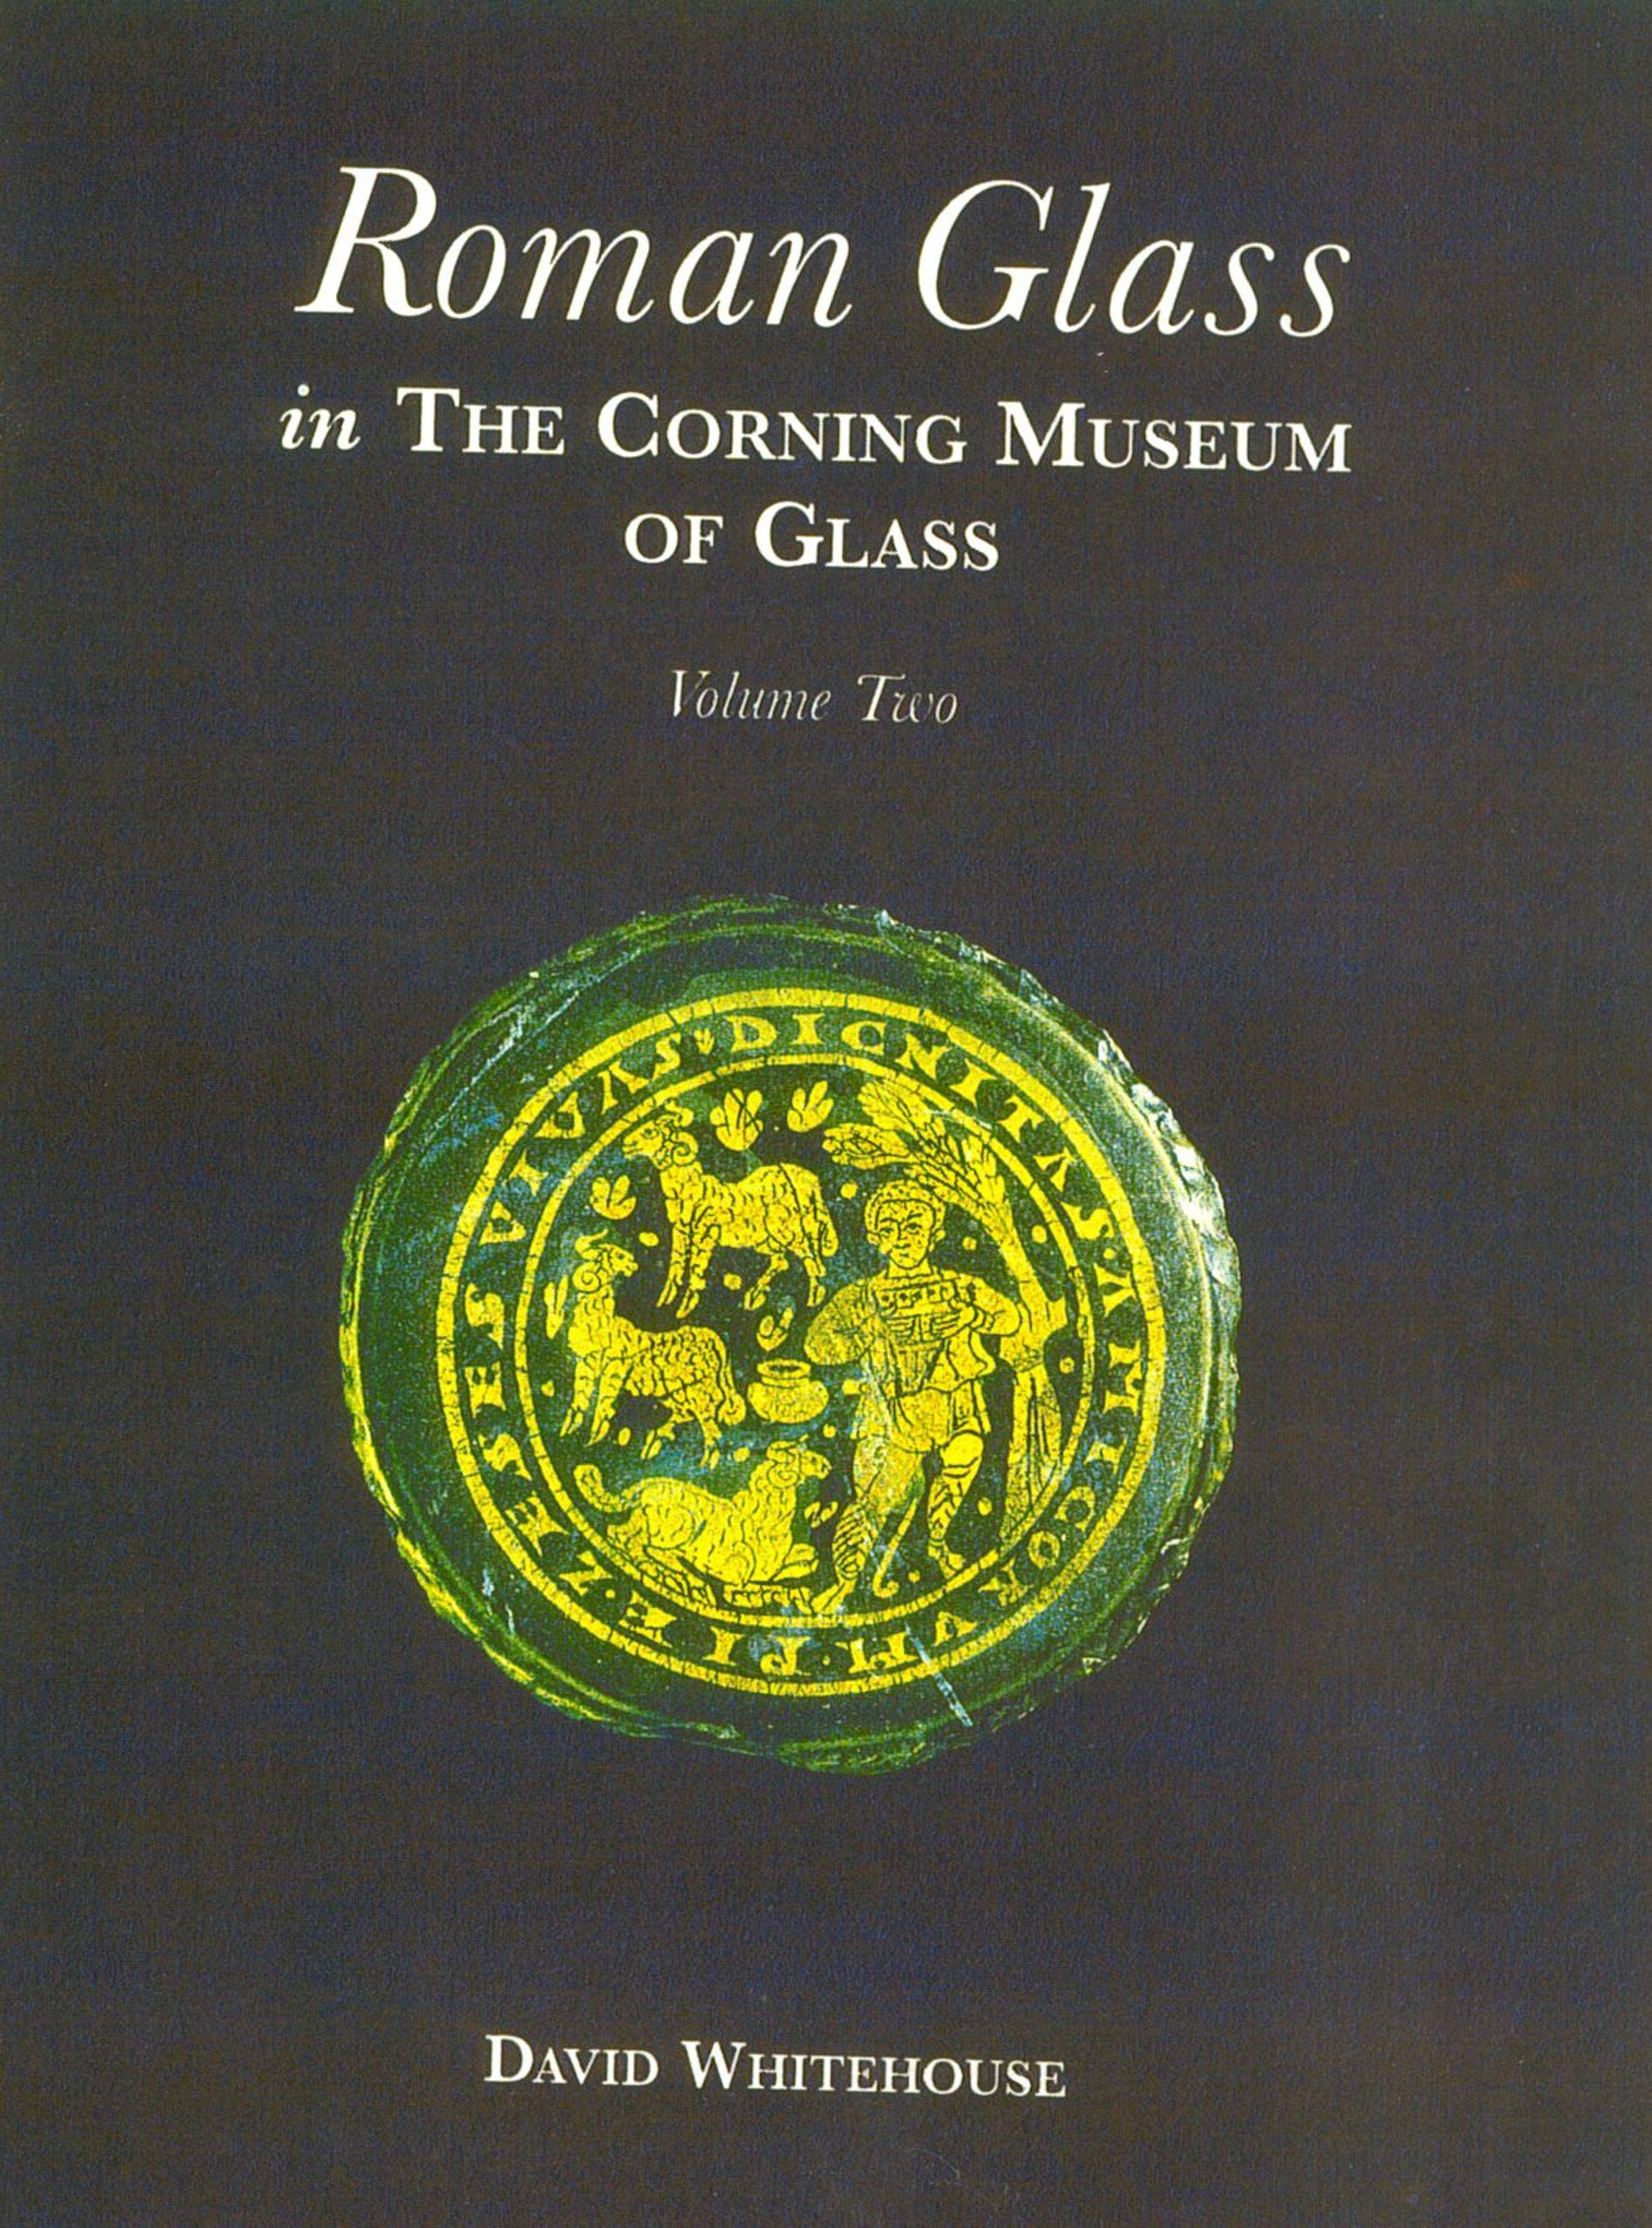 Roman Glass in the Corning Museum of Glass Vol 2 (Catalog) (Volume II) pdf